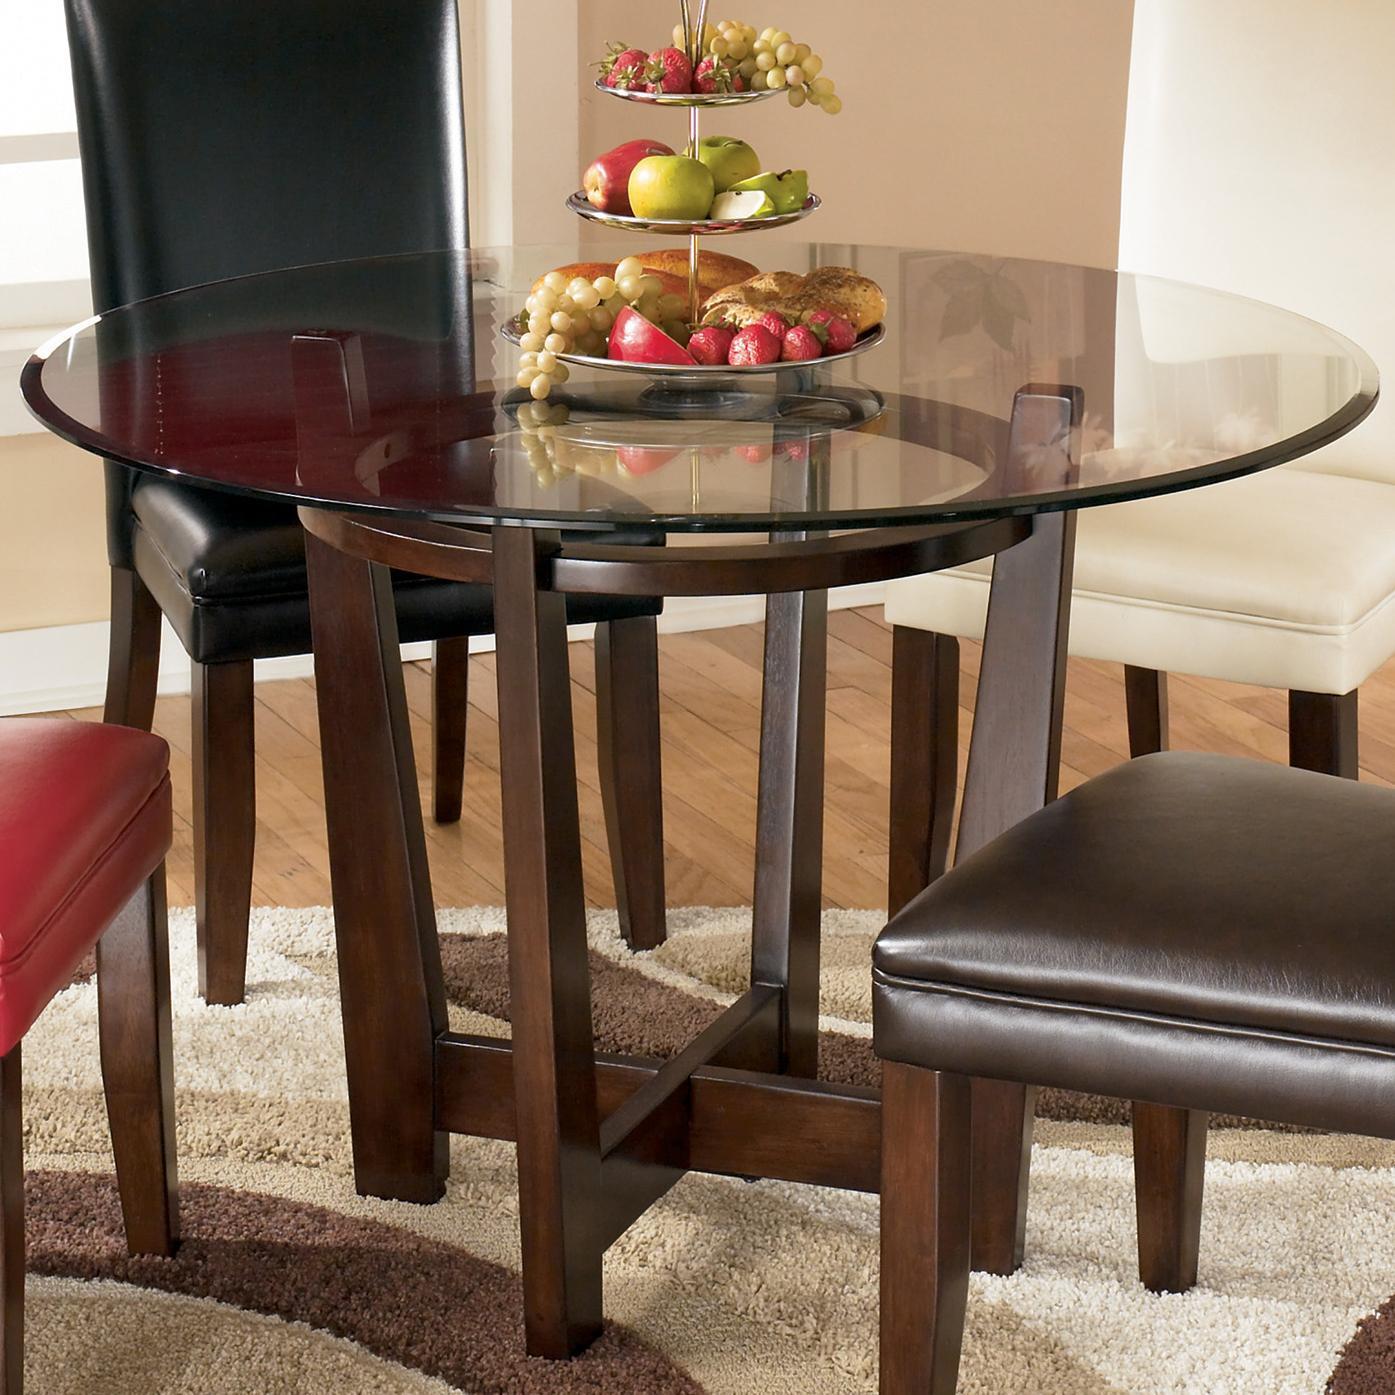 Ashley Furniture Signature Design Charrell D357 15 Round Glass Top Table Del Sol Furniture Kitchen Tables